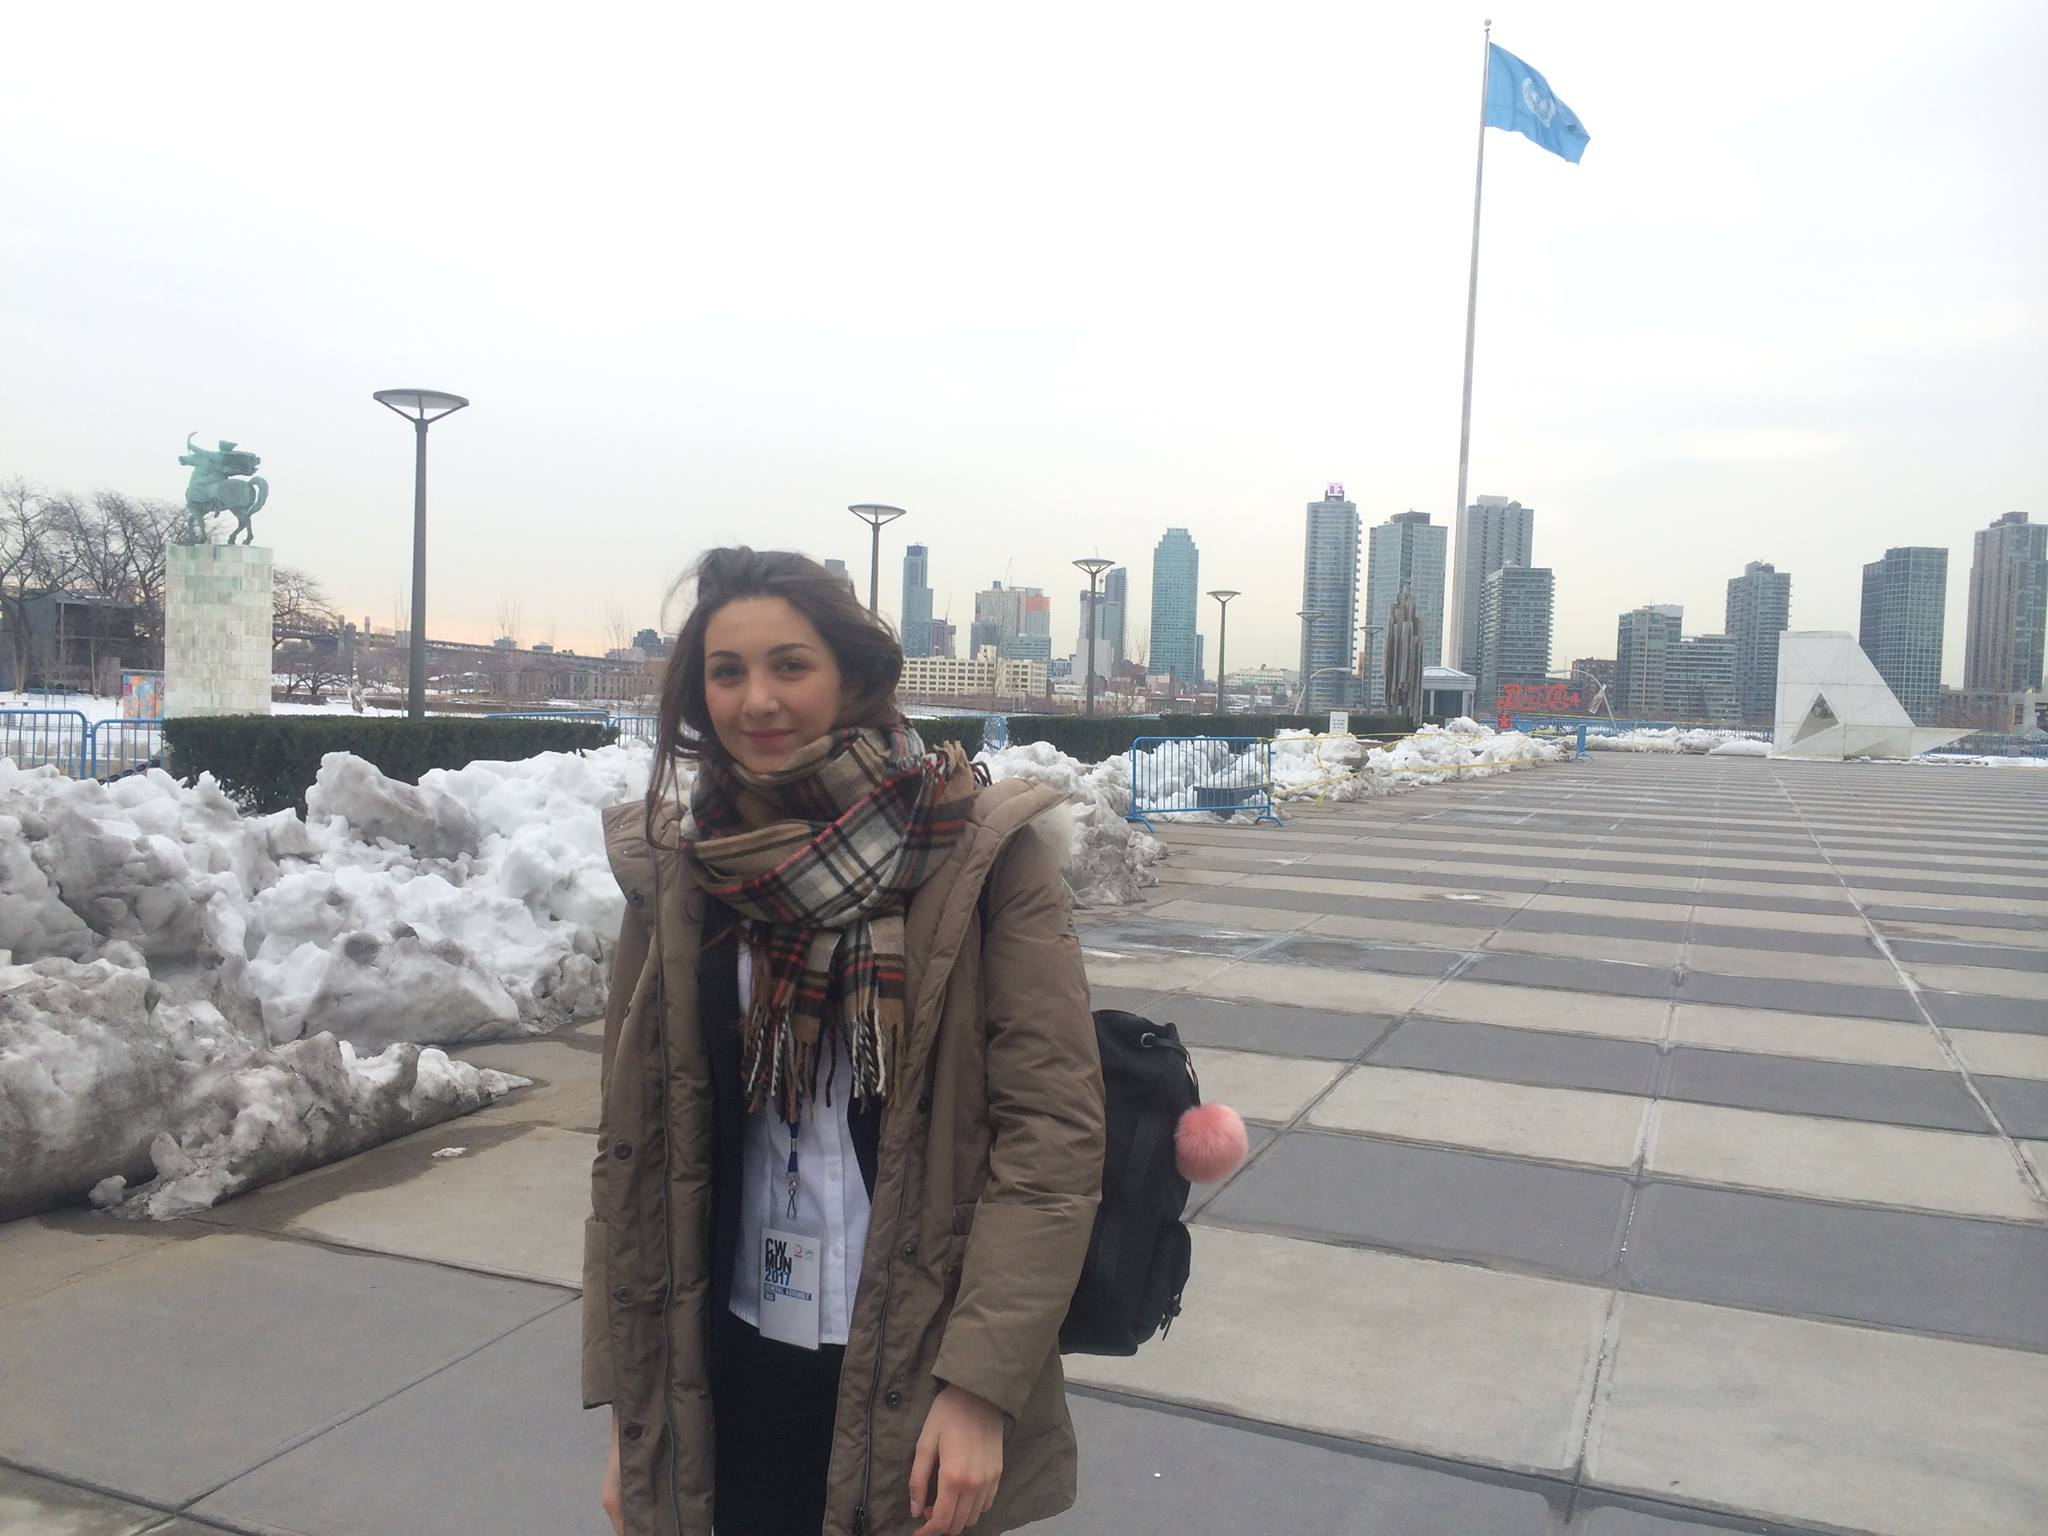 Simulazione assemblea ONU, menzione d'onore per la misilmerese Carlotta Migliore